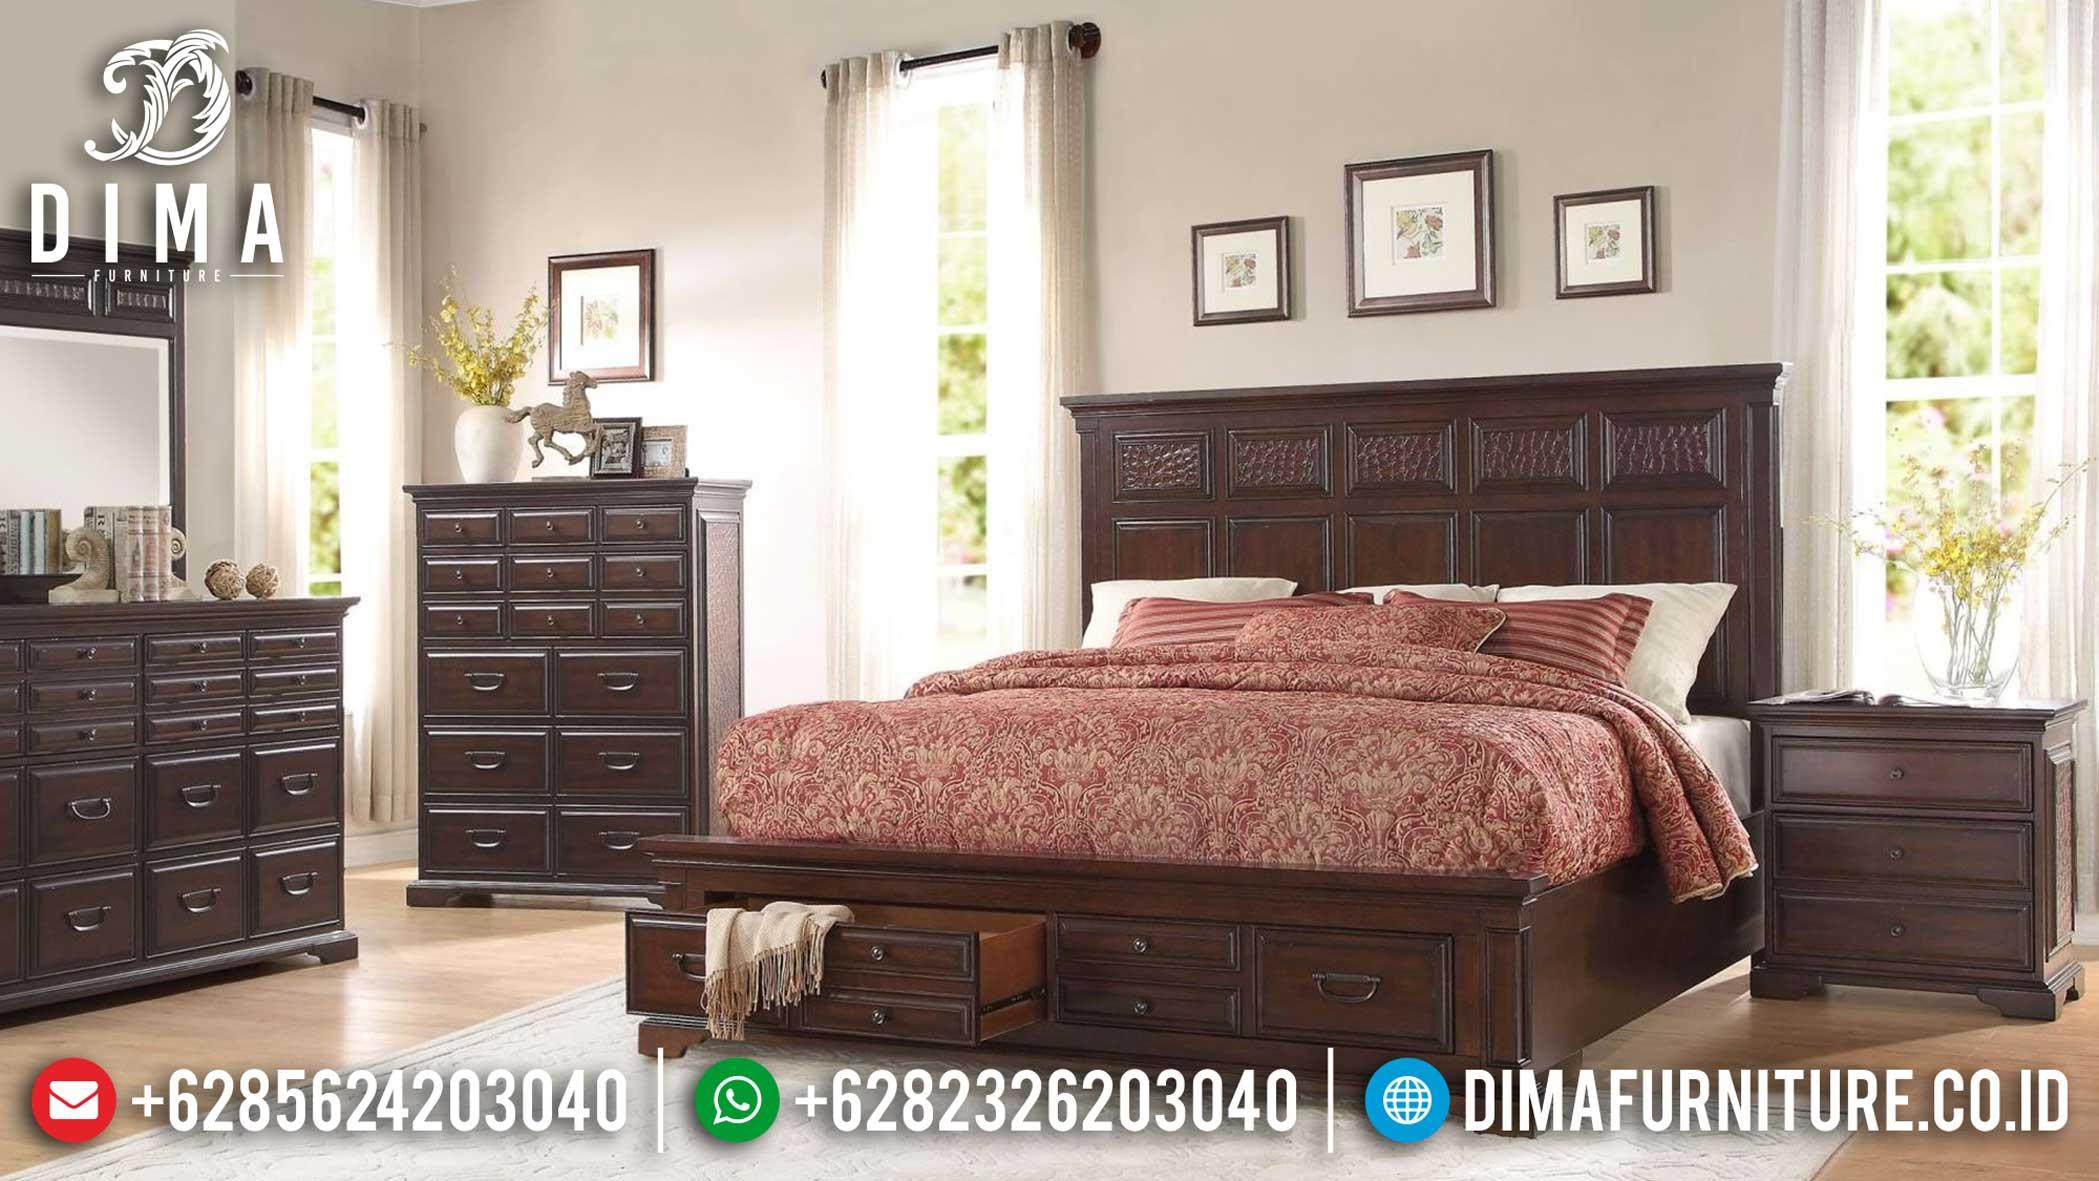 New Tempat Tidur Minimalis Laci Jati Natural Auburn Elegant Design TTJ-1118